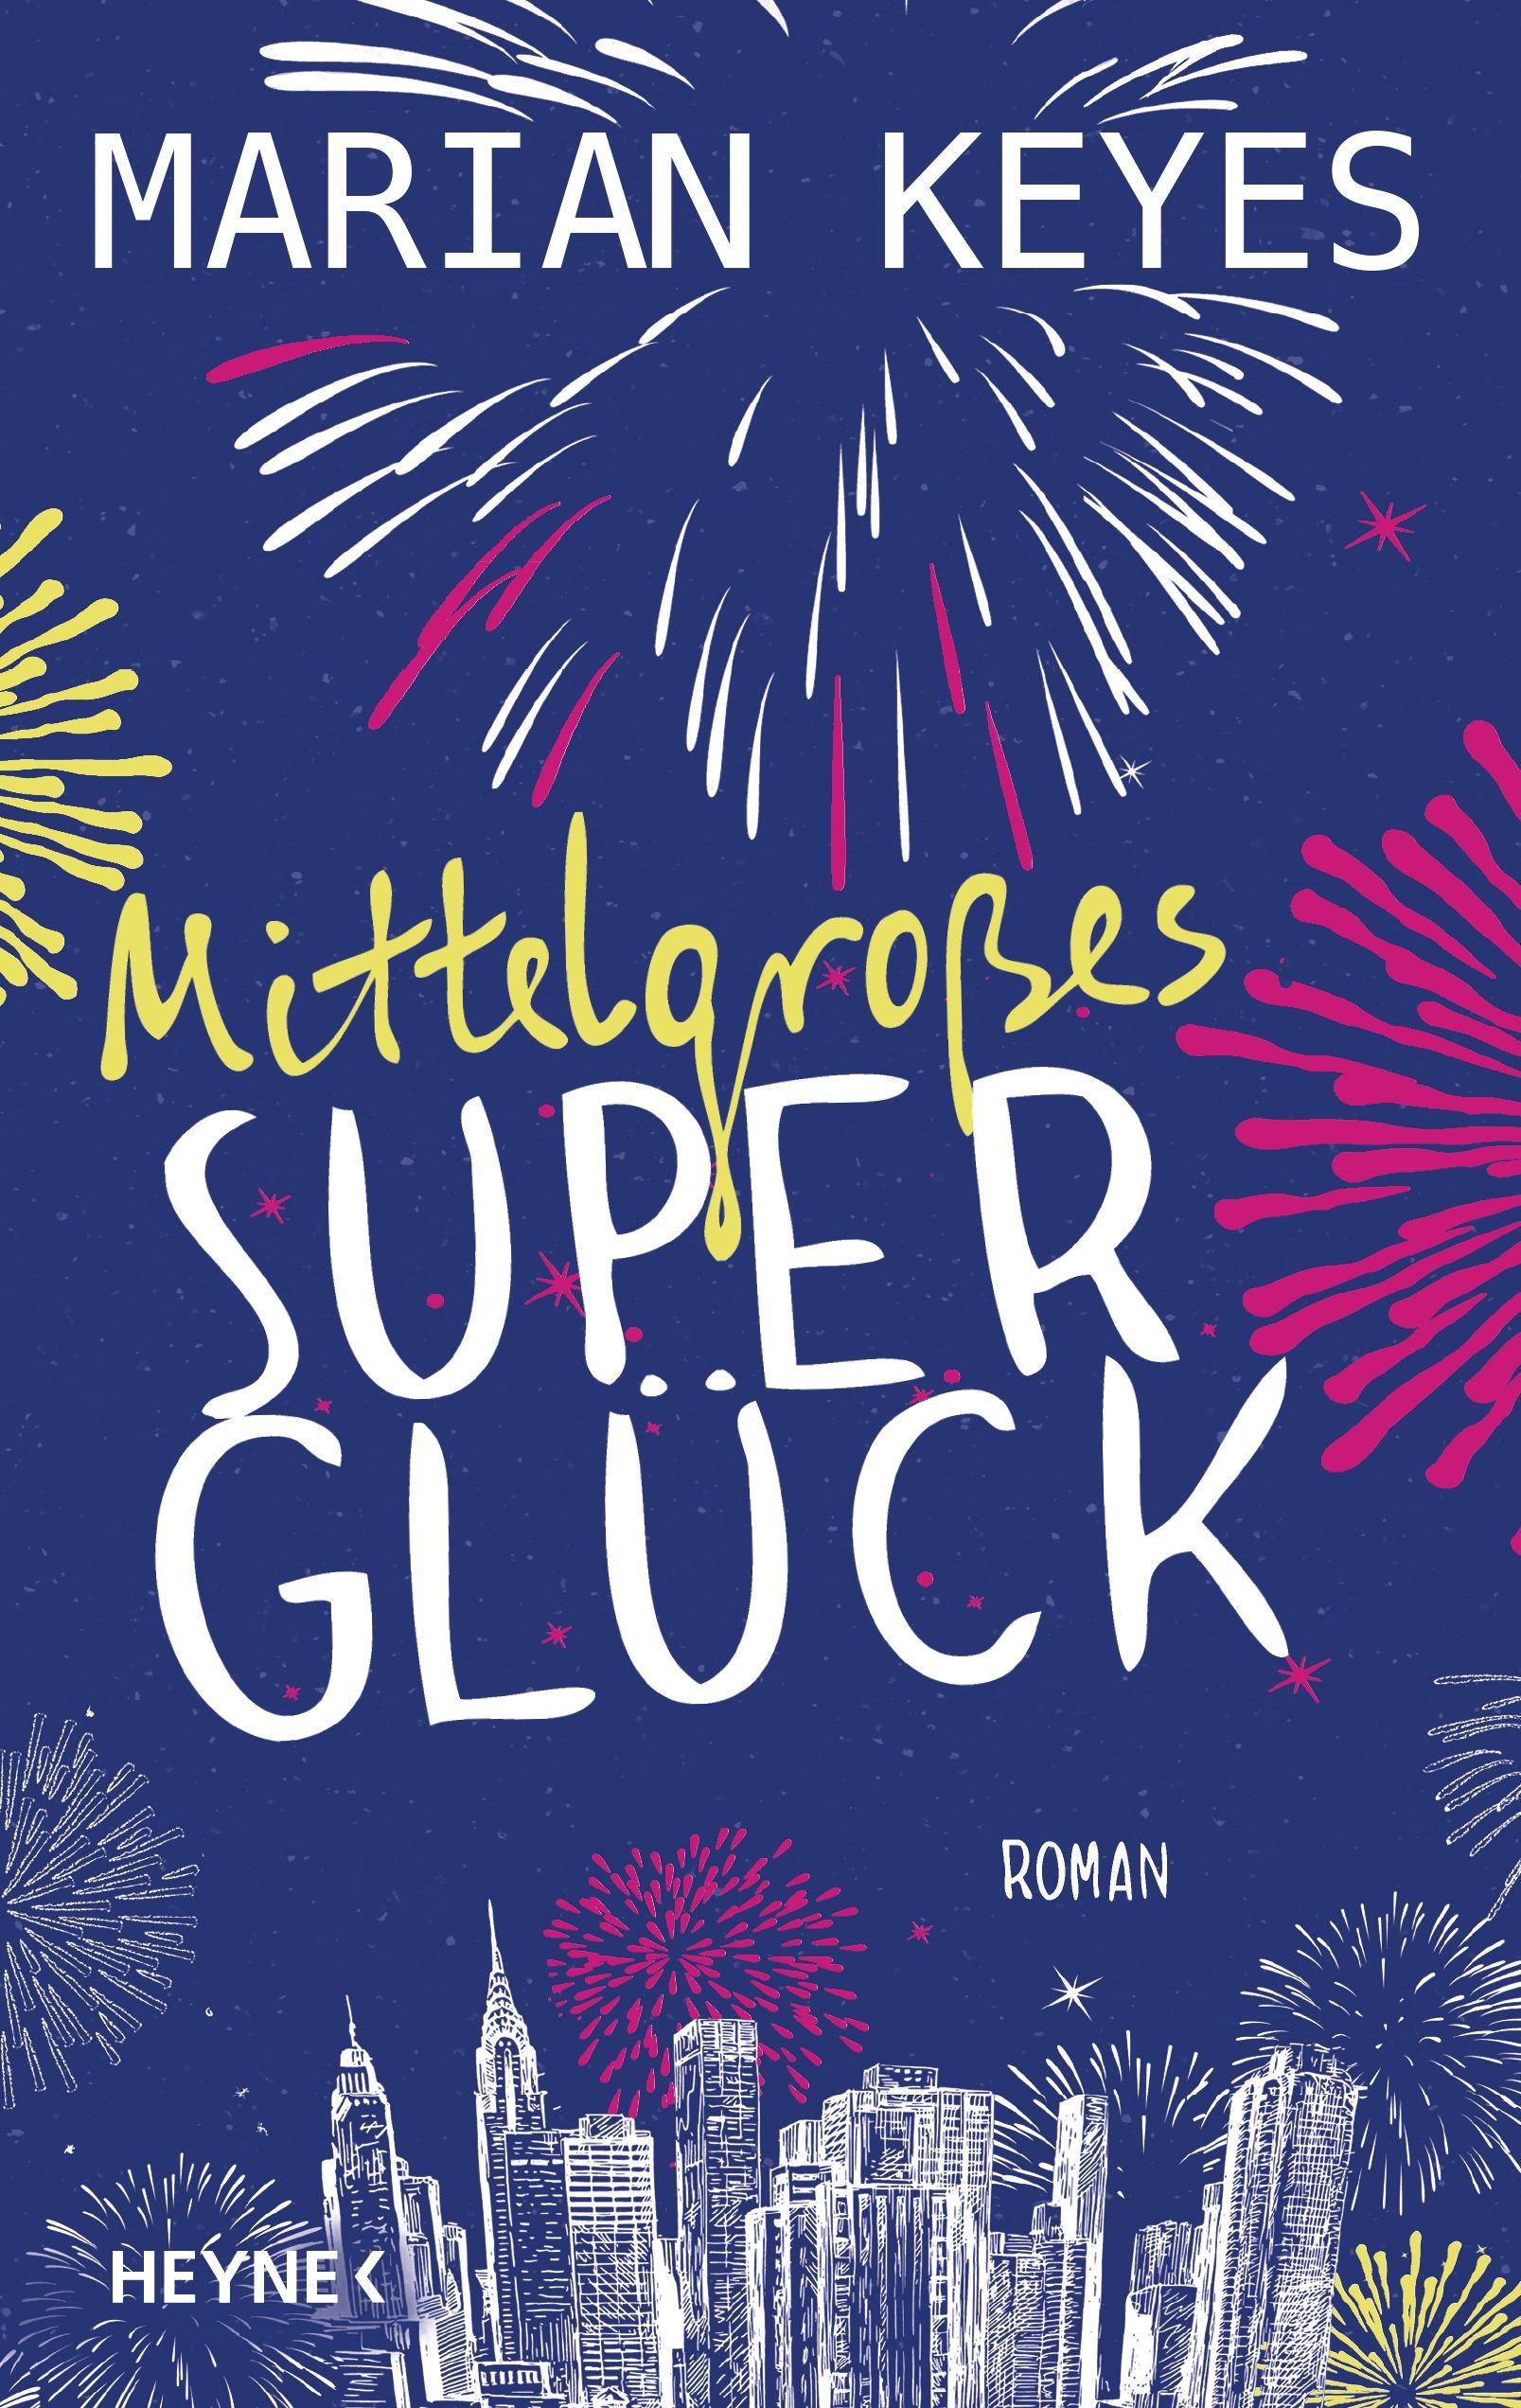 Mittelgroßes Superglück - Marian Keyes